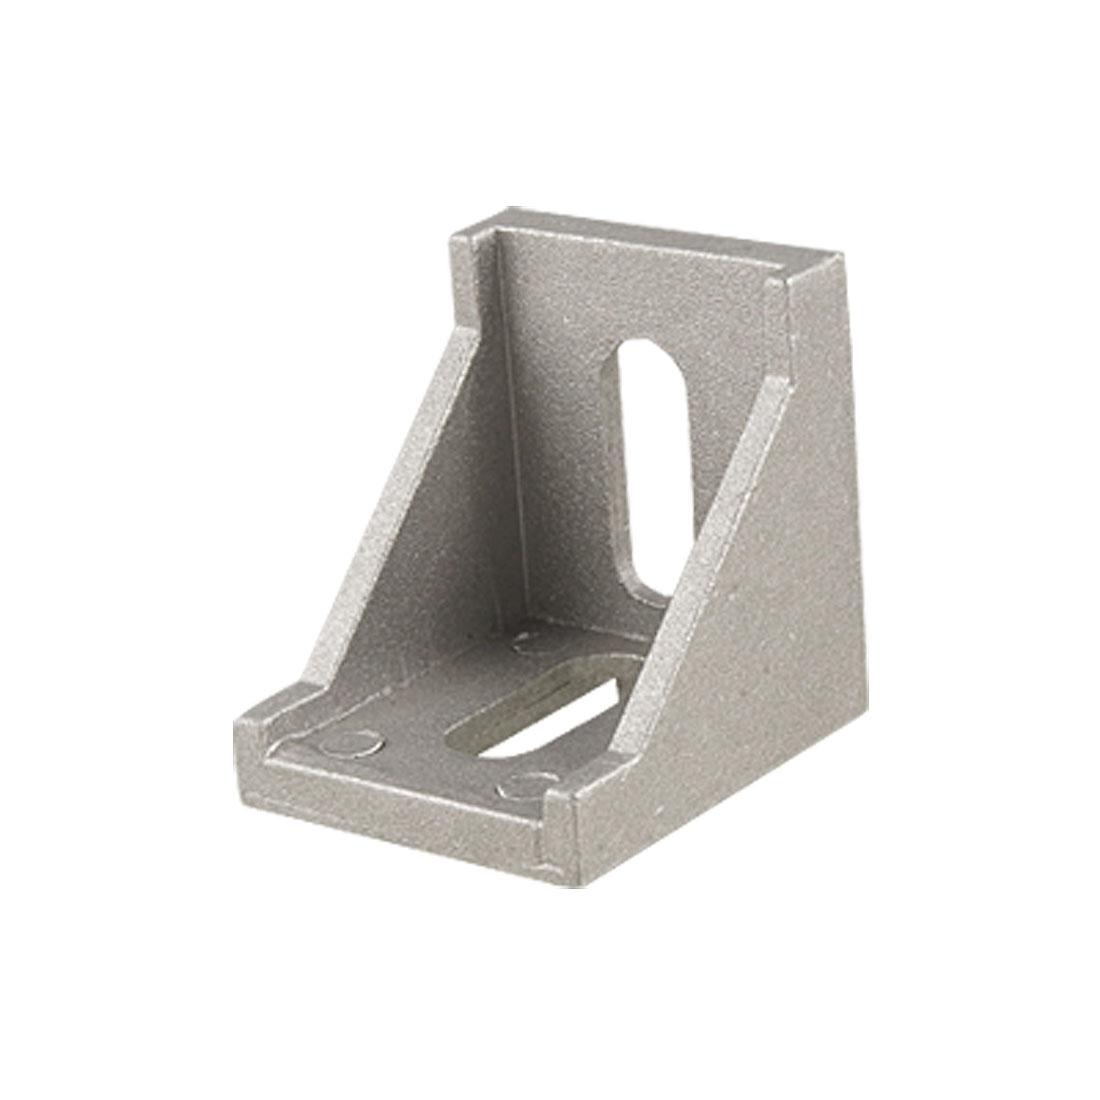 Furniture Door Fastener 90 Degree Alloy Corner Angle Bracket